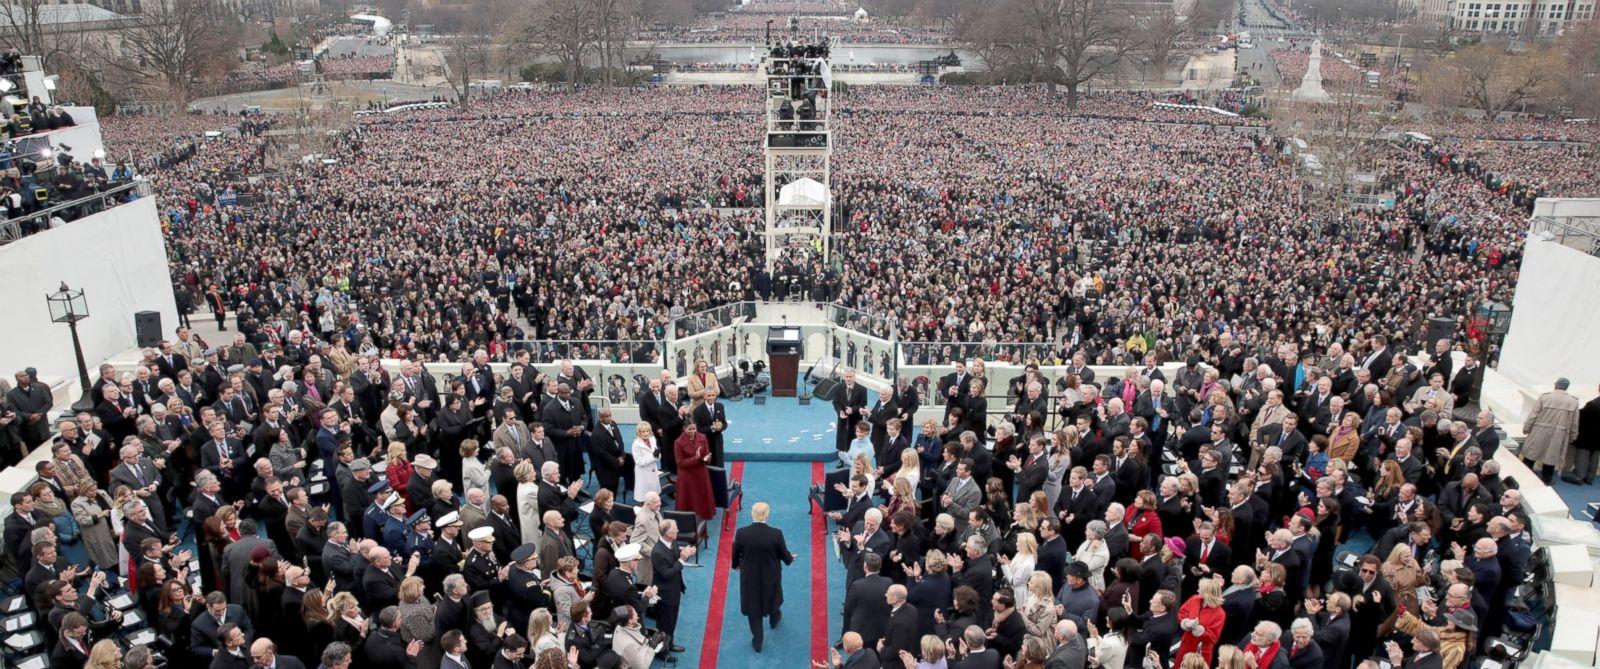 The Inauguration Of Donald J. Trump - ABC NEWS, Richard Ehrenberg Lead Technical Director.